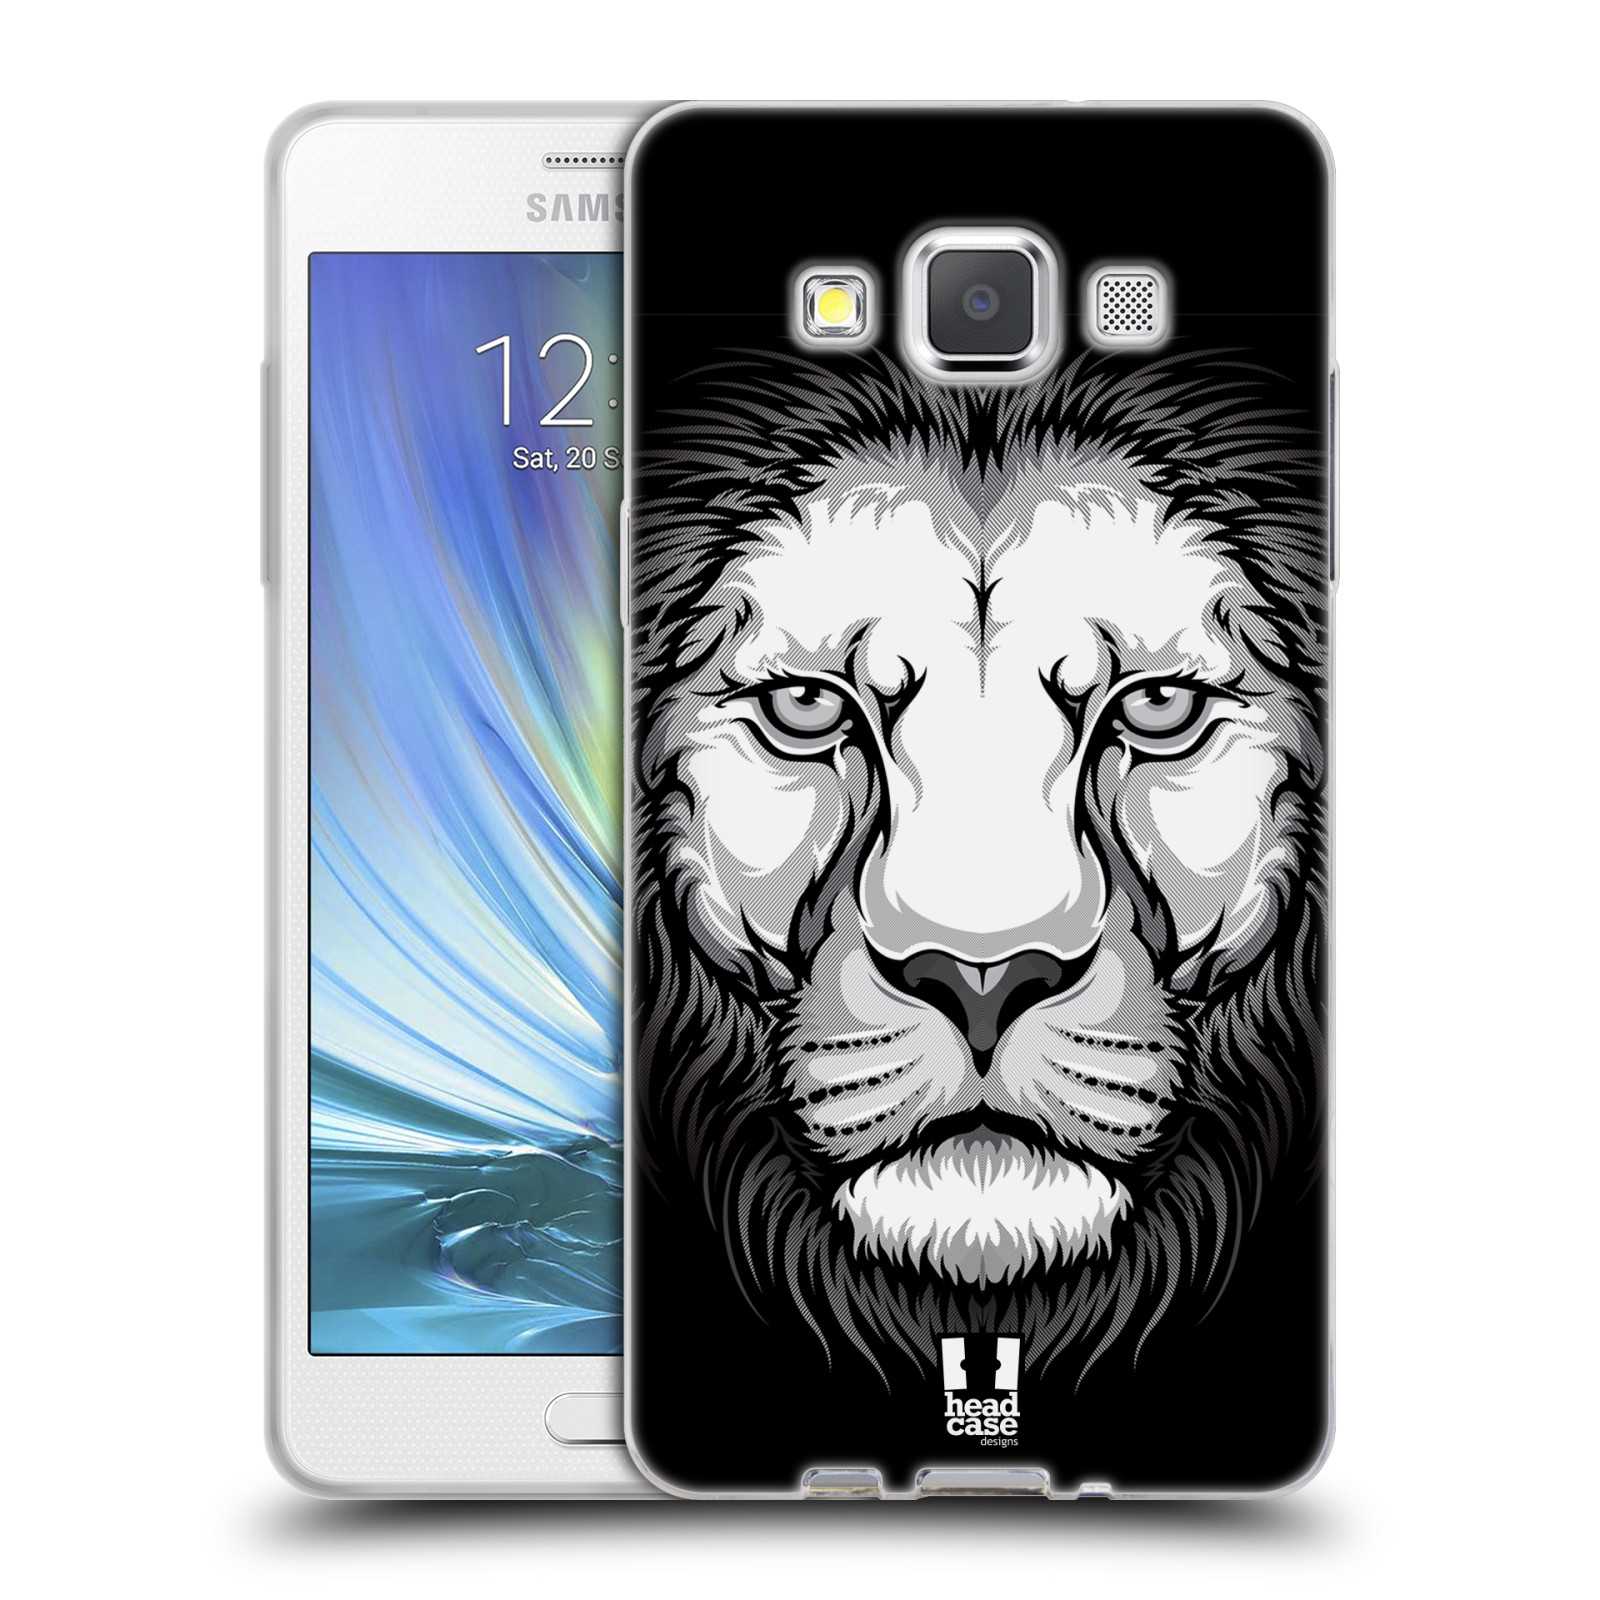 HEAD CASE silikonový obal na mobil Samsung Galaxy A5 vzor Zvíře kreslená tvář lev